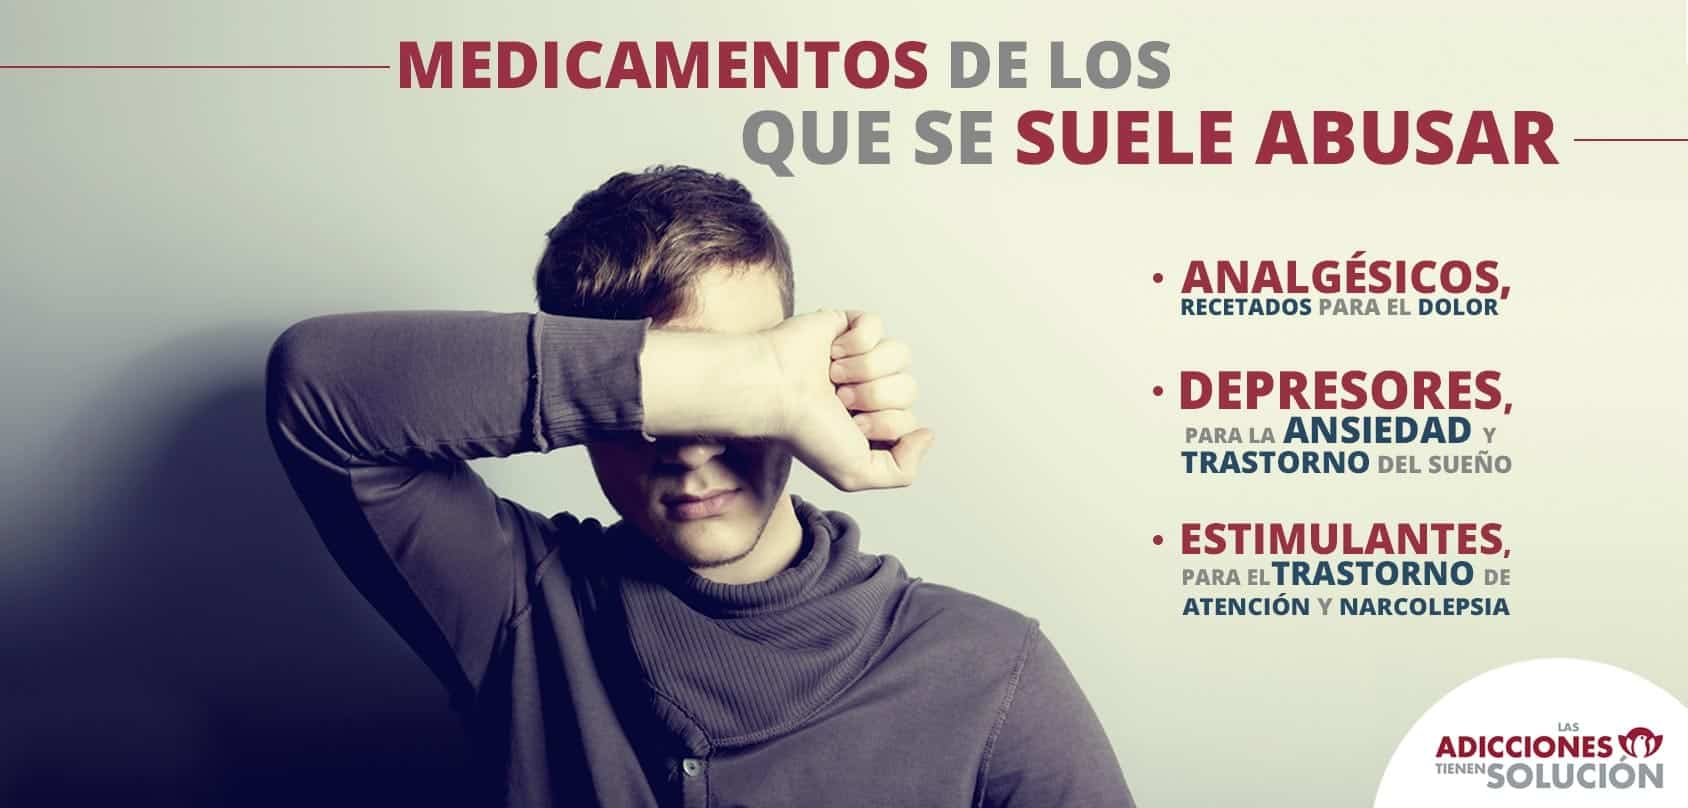 Abuso medicamentos